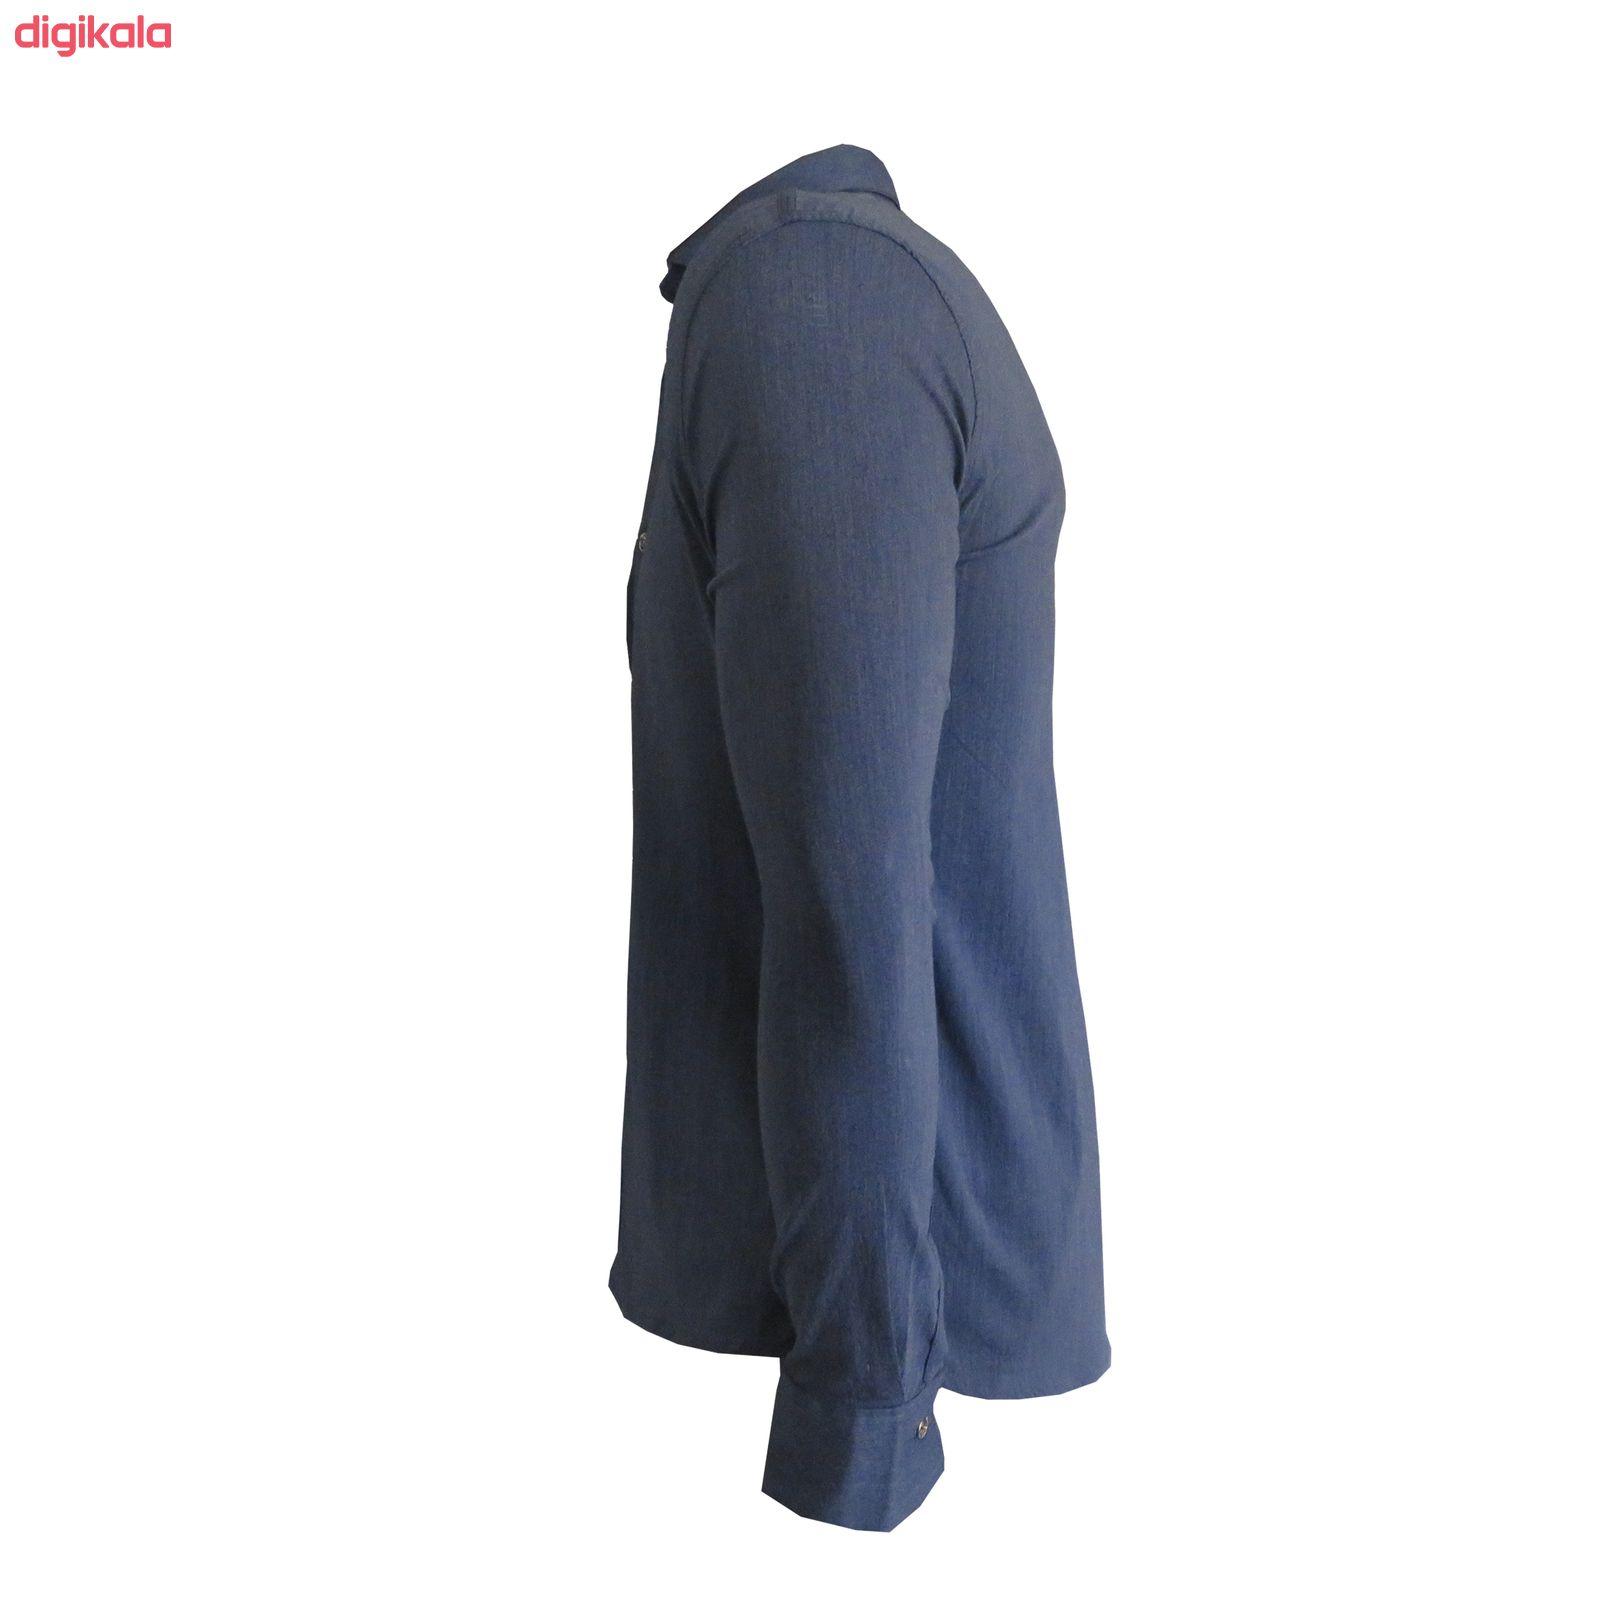 پیراهن مردانه کد PVLFZ9904B3 رنگ آبی main 1 3